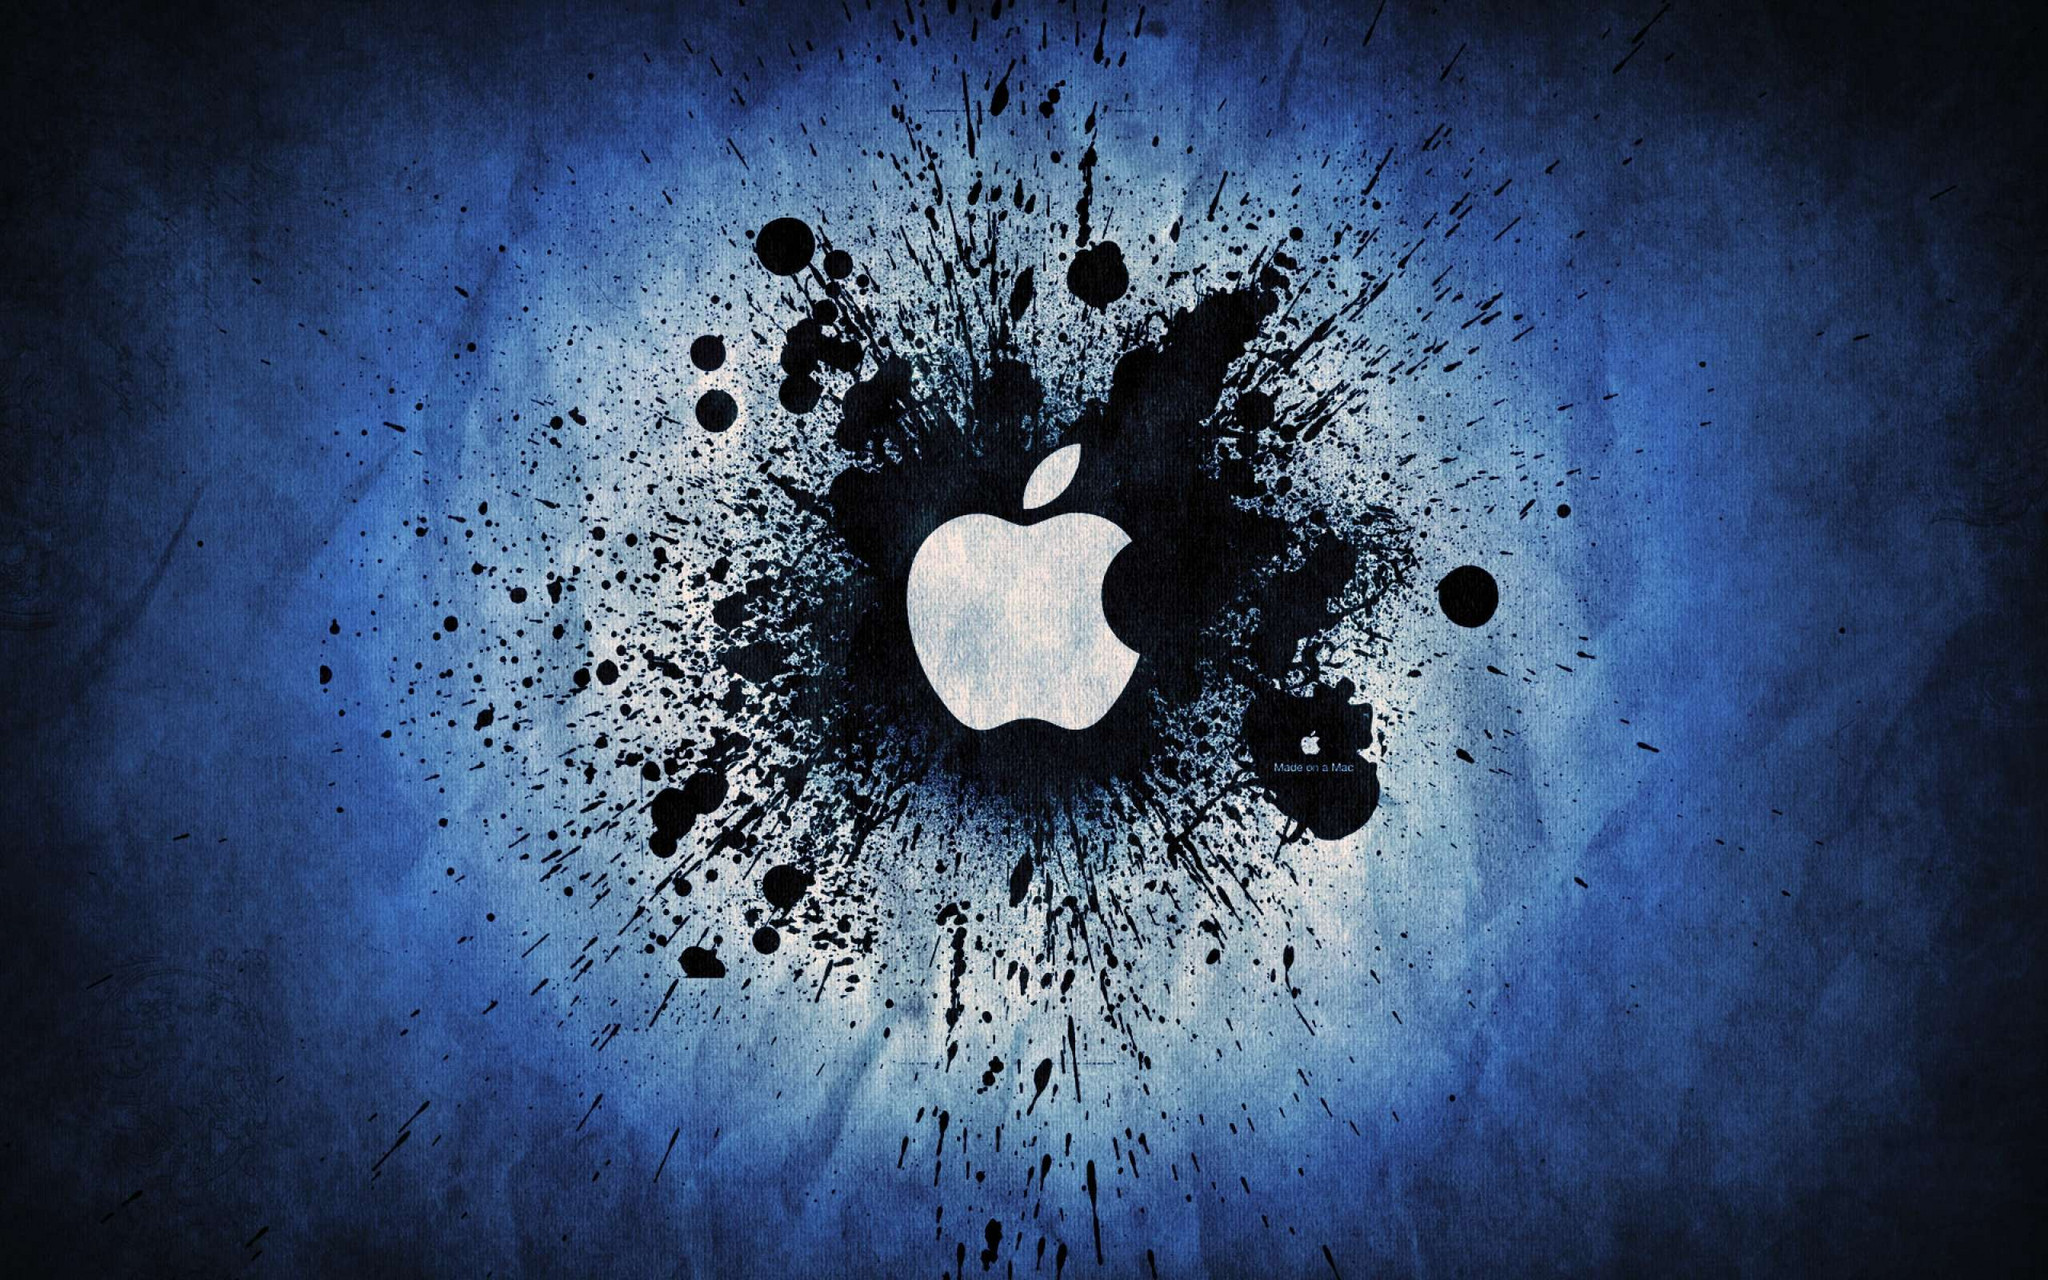 Apple wallpaper.jpeg